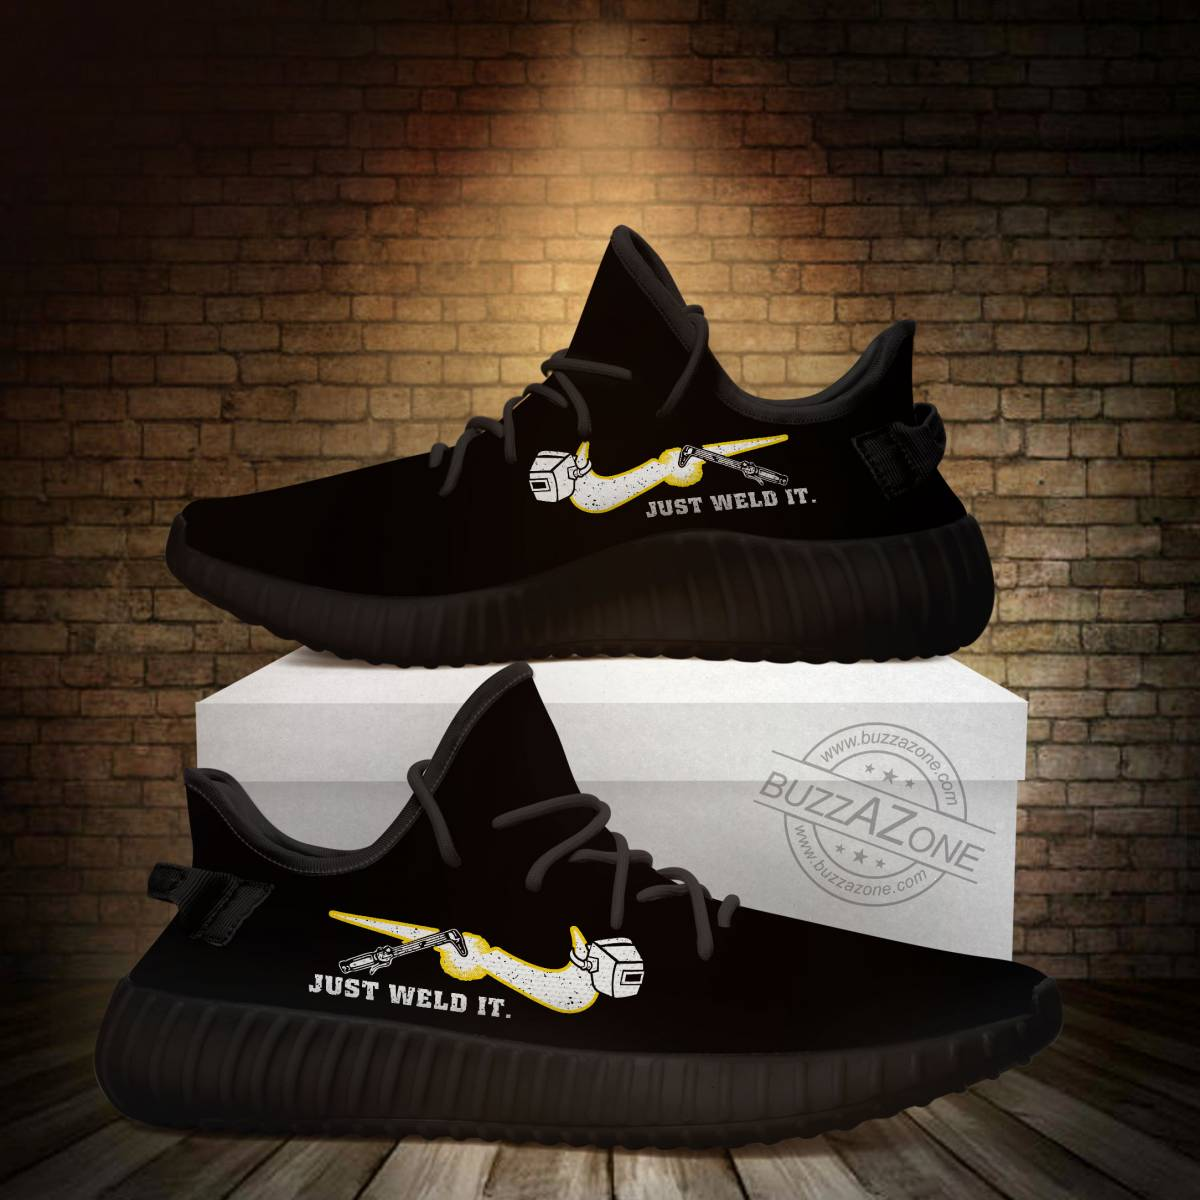 Just weld it custom yeezy sneakers 1